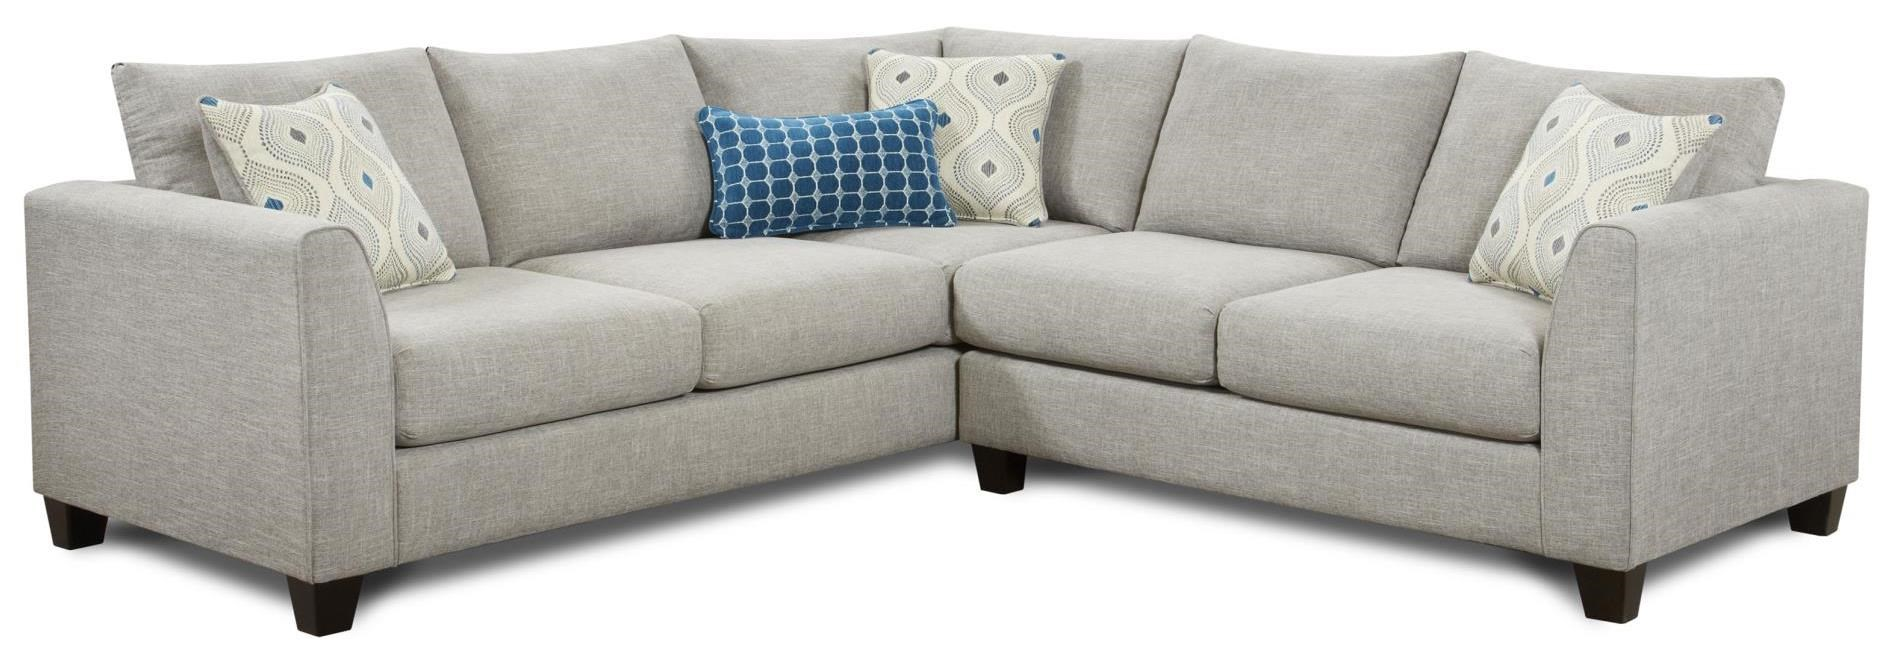 Fusion Furniture 2800 2 Piece Corner Sectional